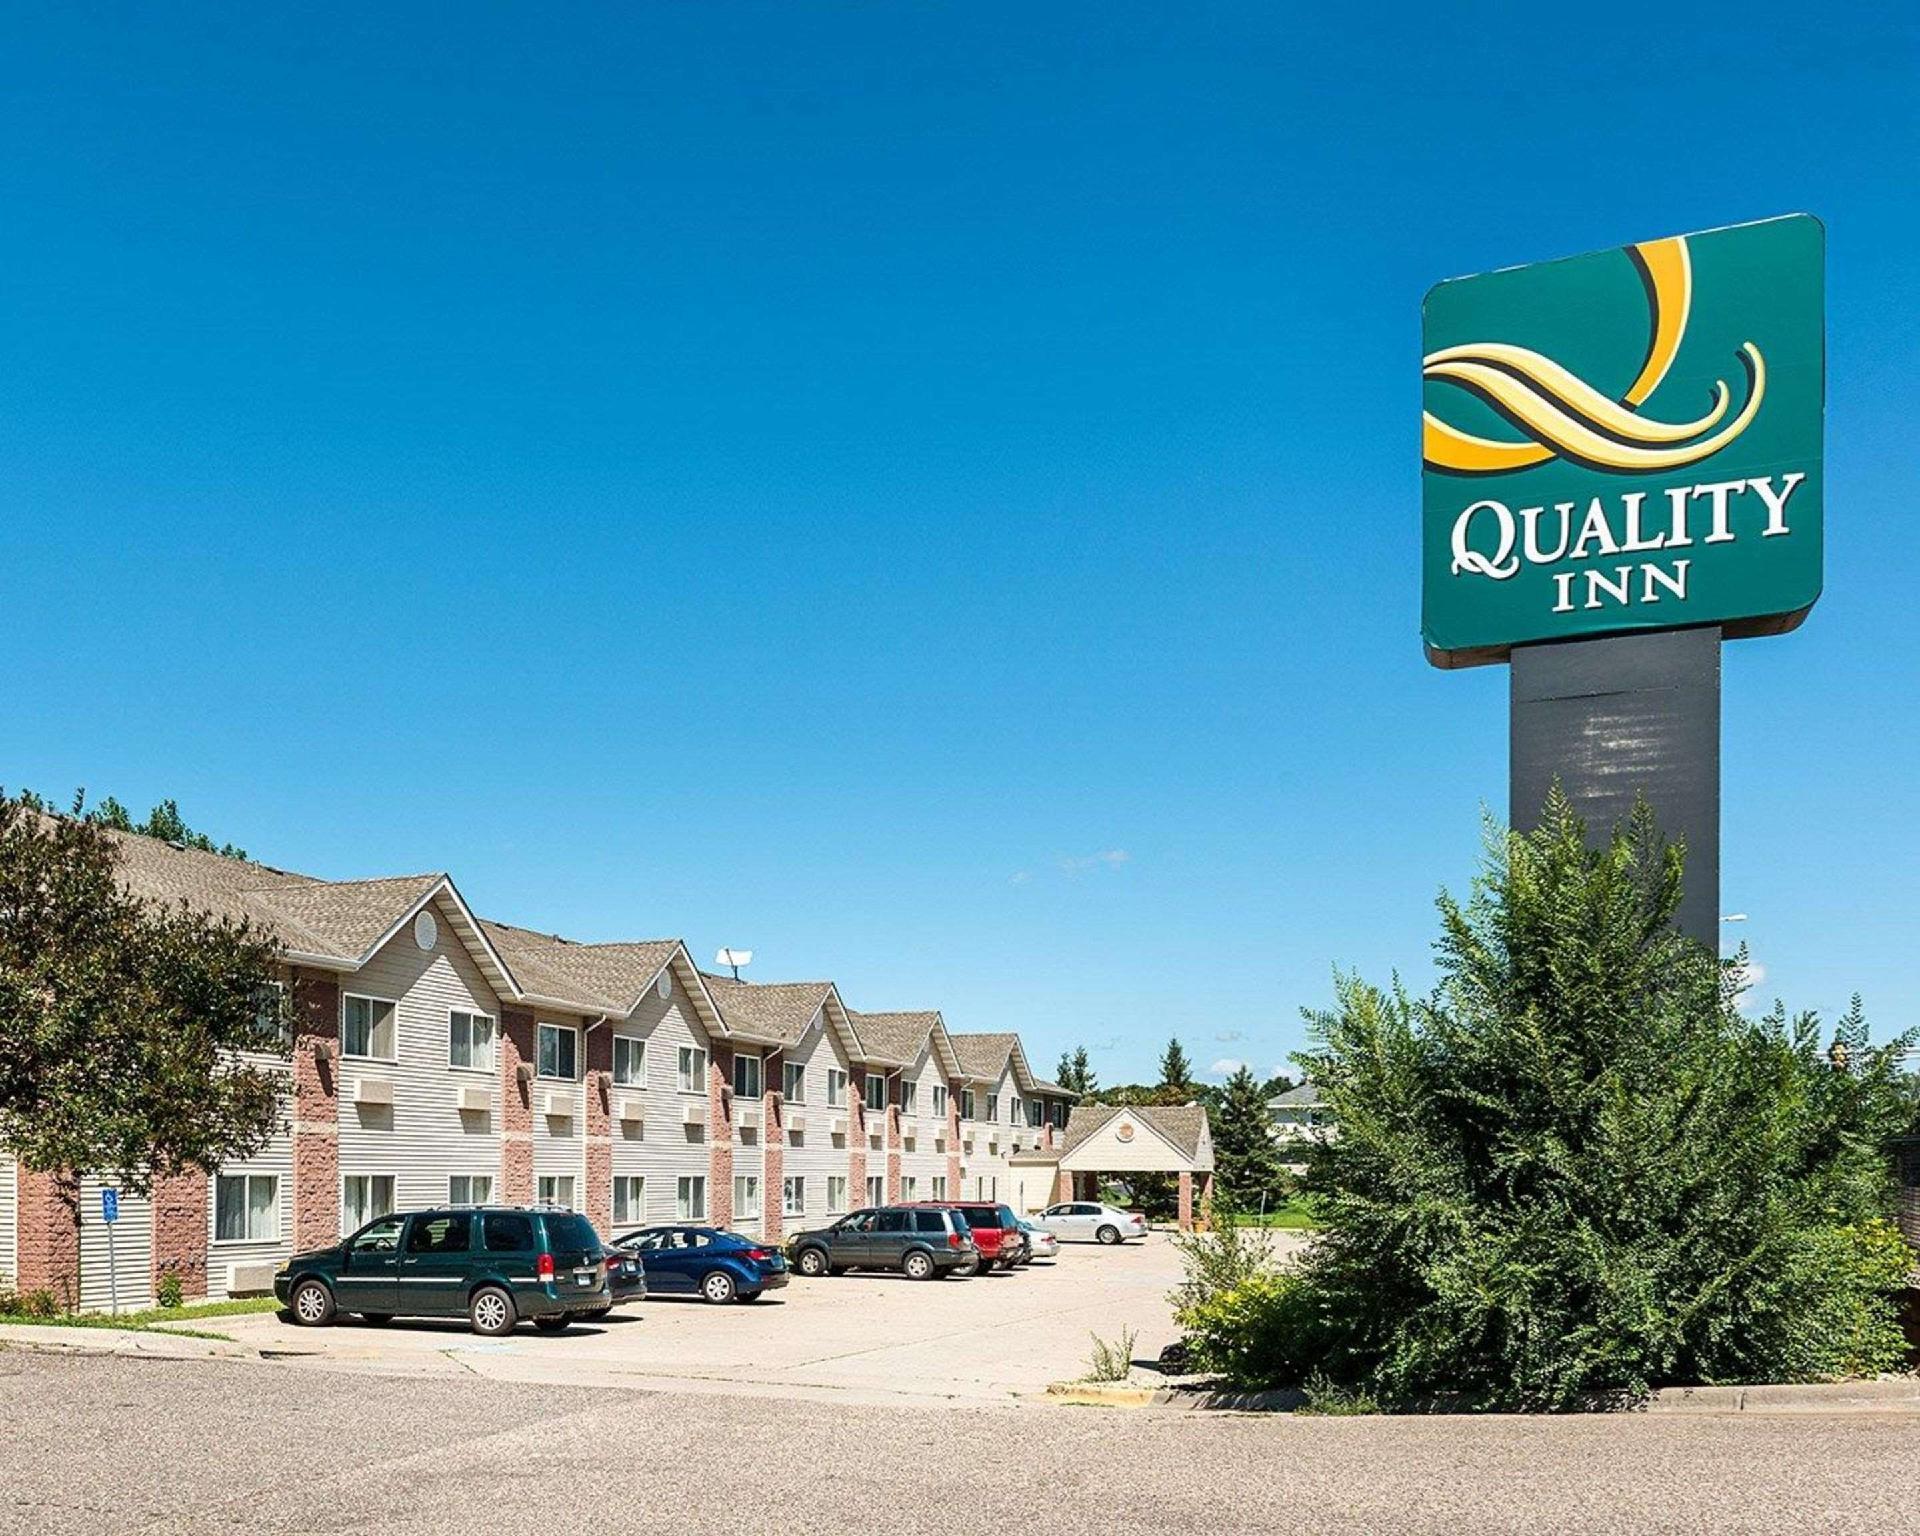 Quality Inn Northtown